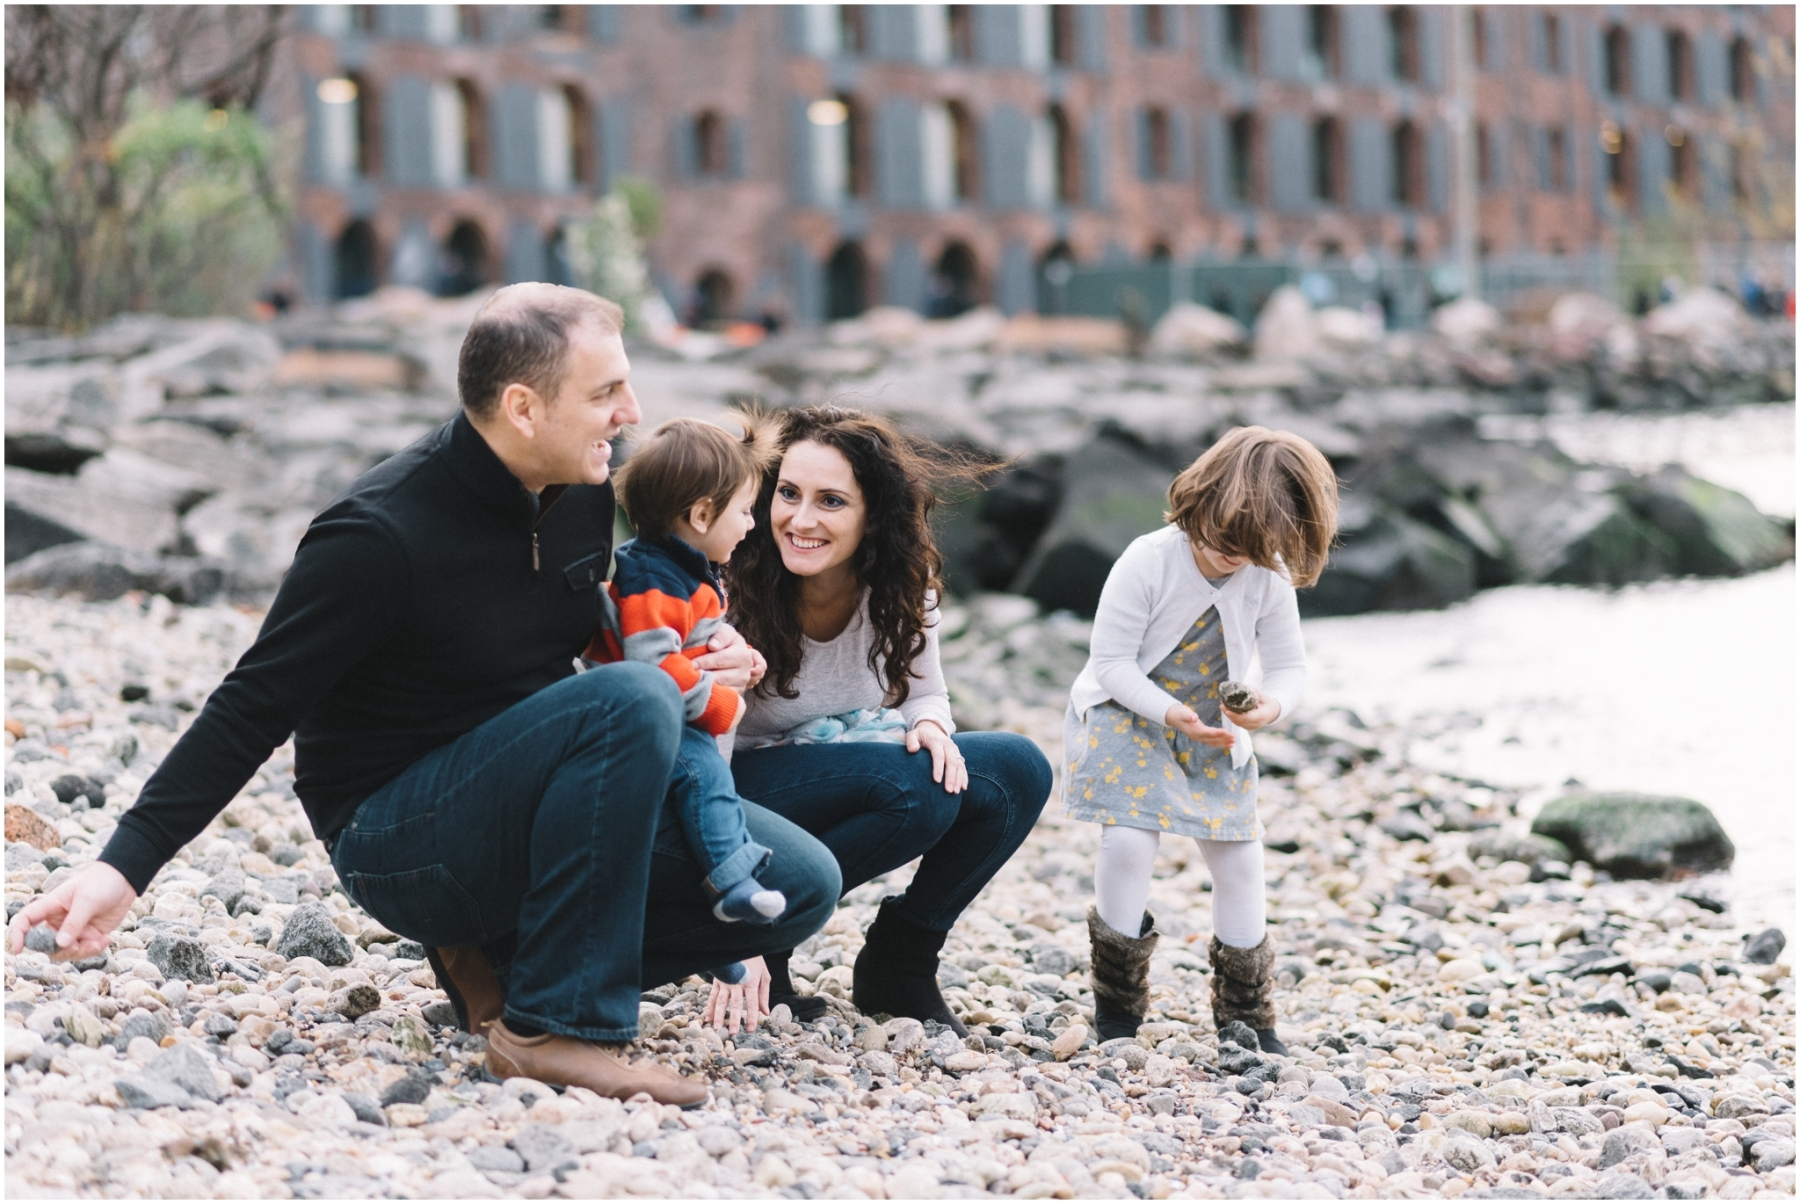 Brooklyn Bridge Park Family Lifestyle Session by Ardita Kola Photography